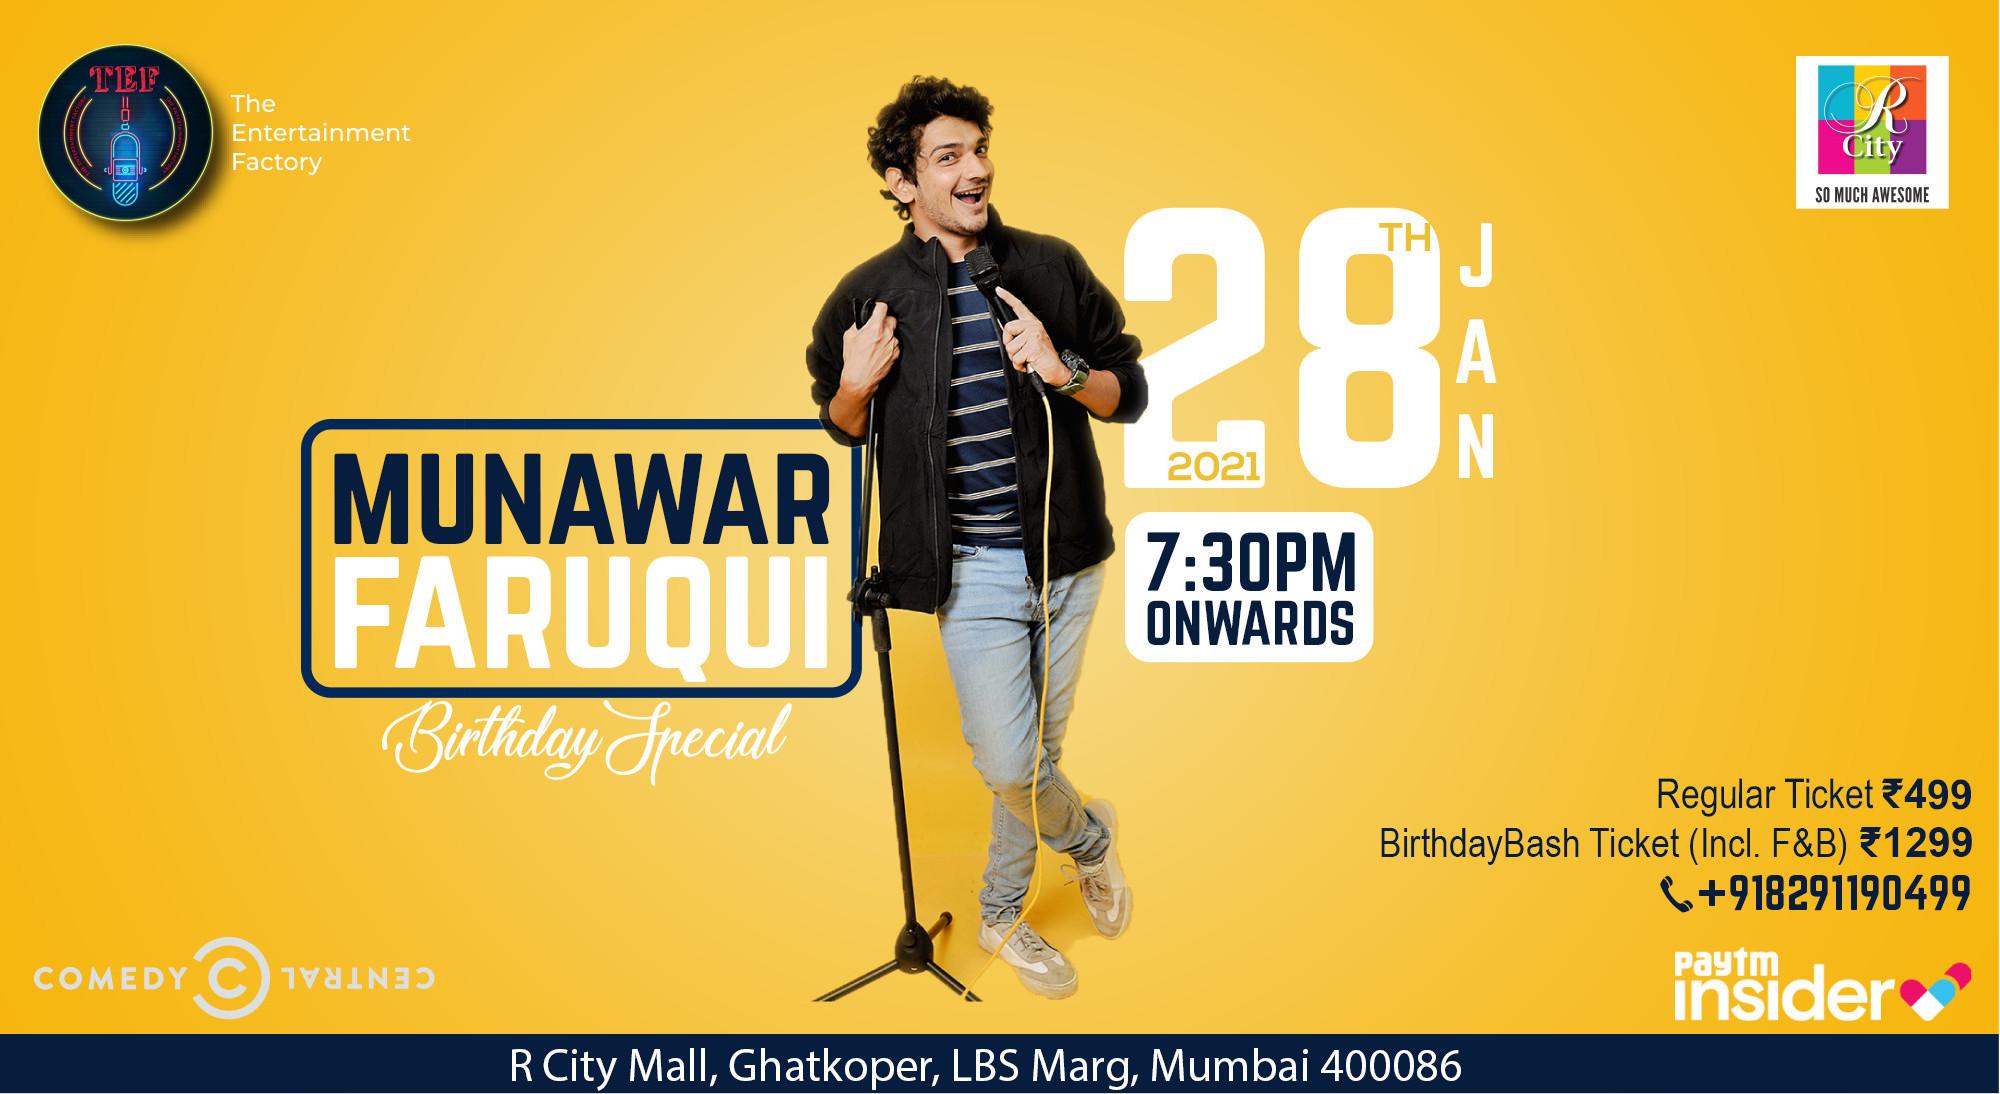 Munawar Faruqui- Birthday Special